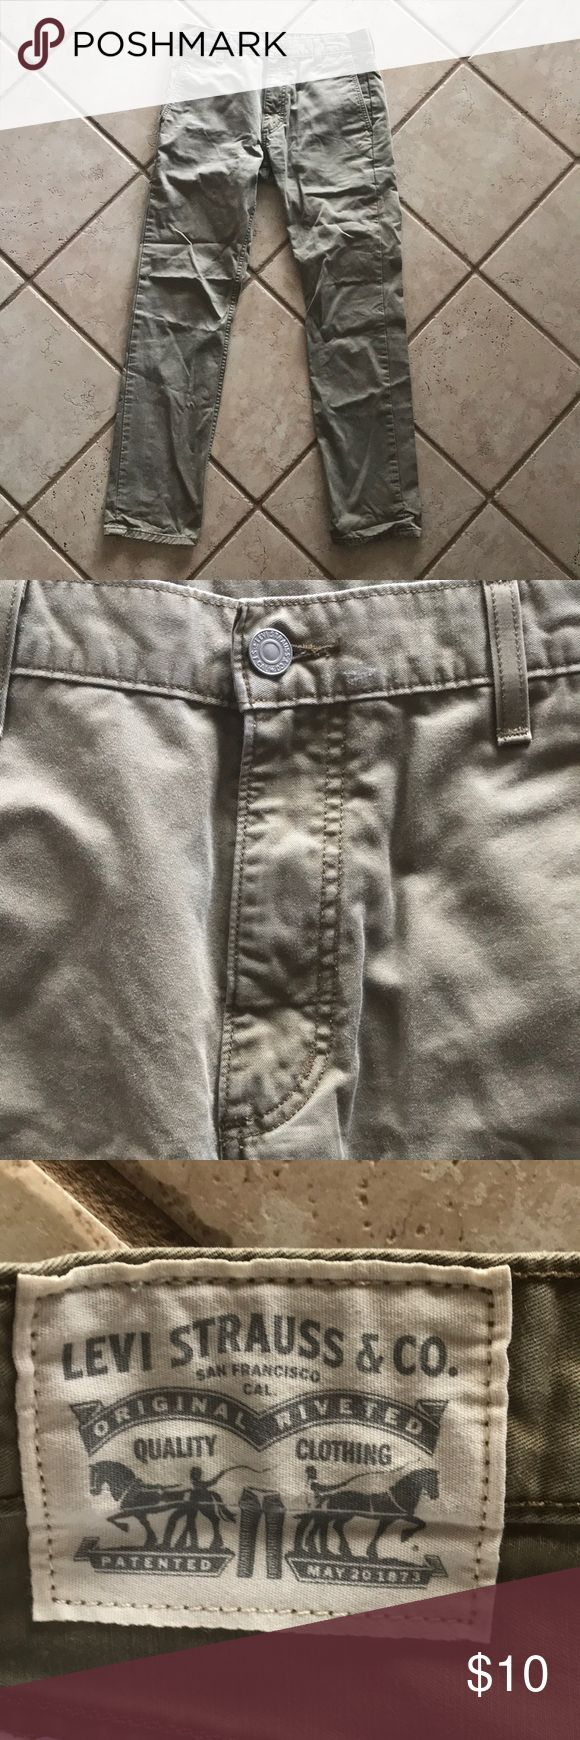 Levi's Pants Levi's 511 Pants in beige Levi's Pants Chinos & Khakis